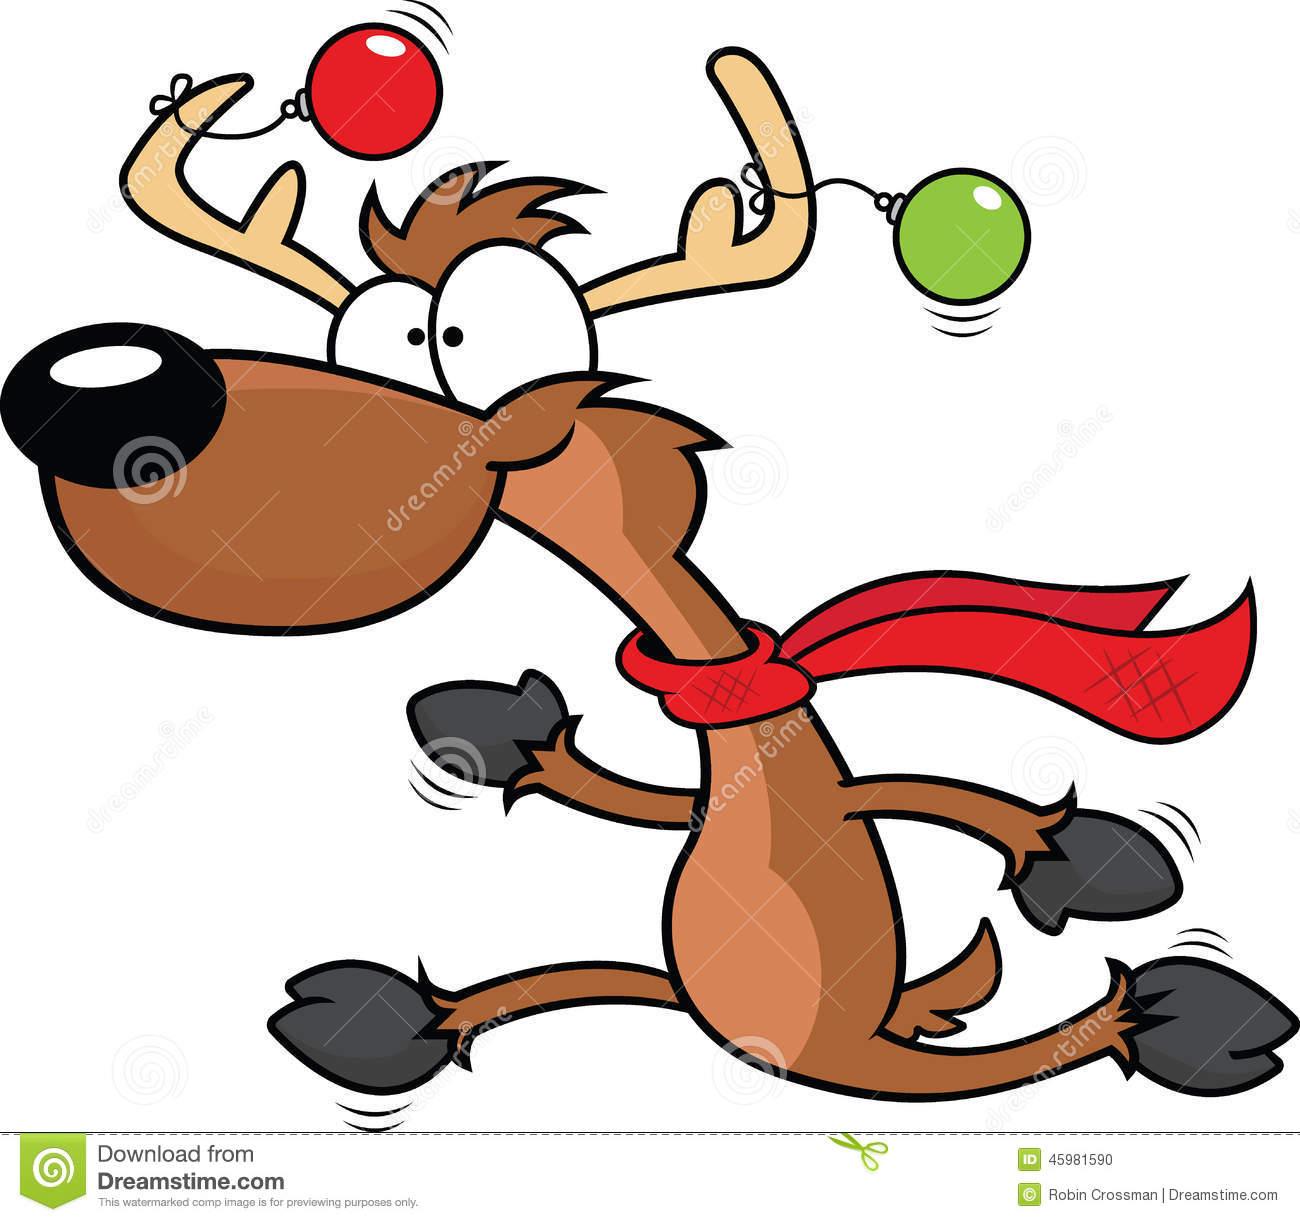 1300x1222 Goofy Reindeer Clip Art Merry Christmas Amp Happy New Year Arts